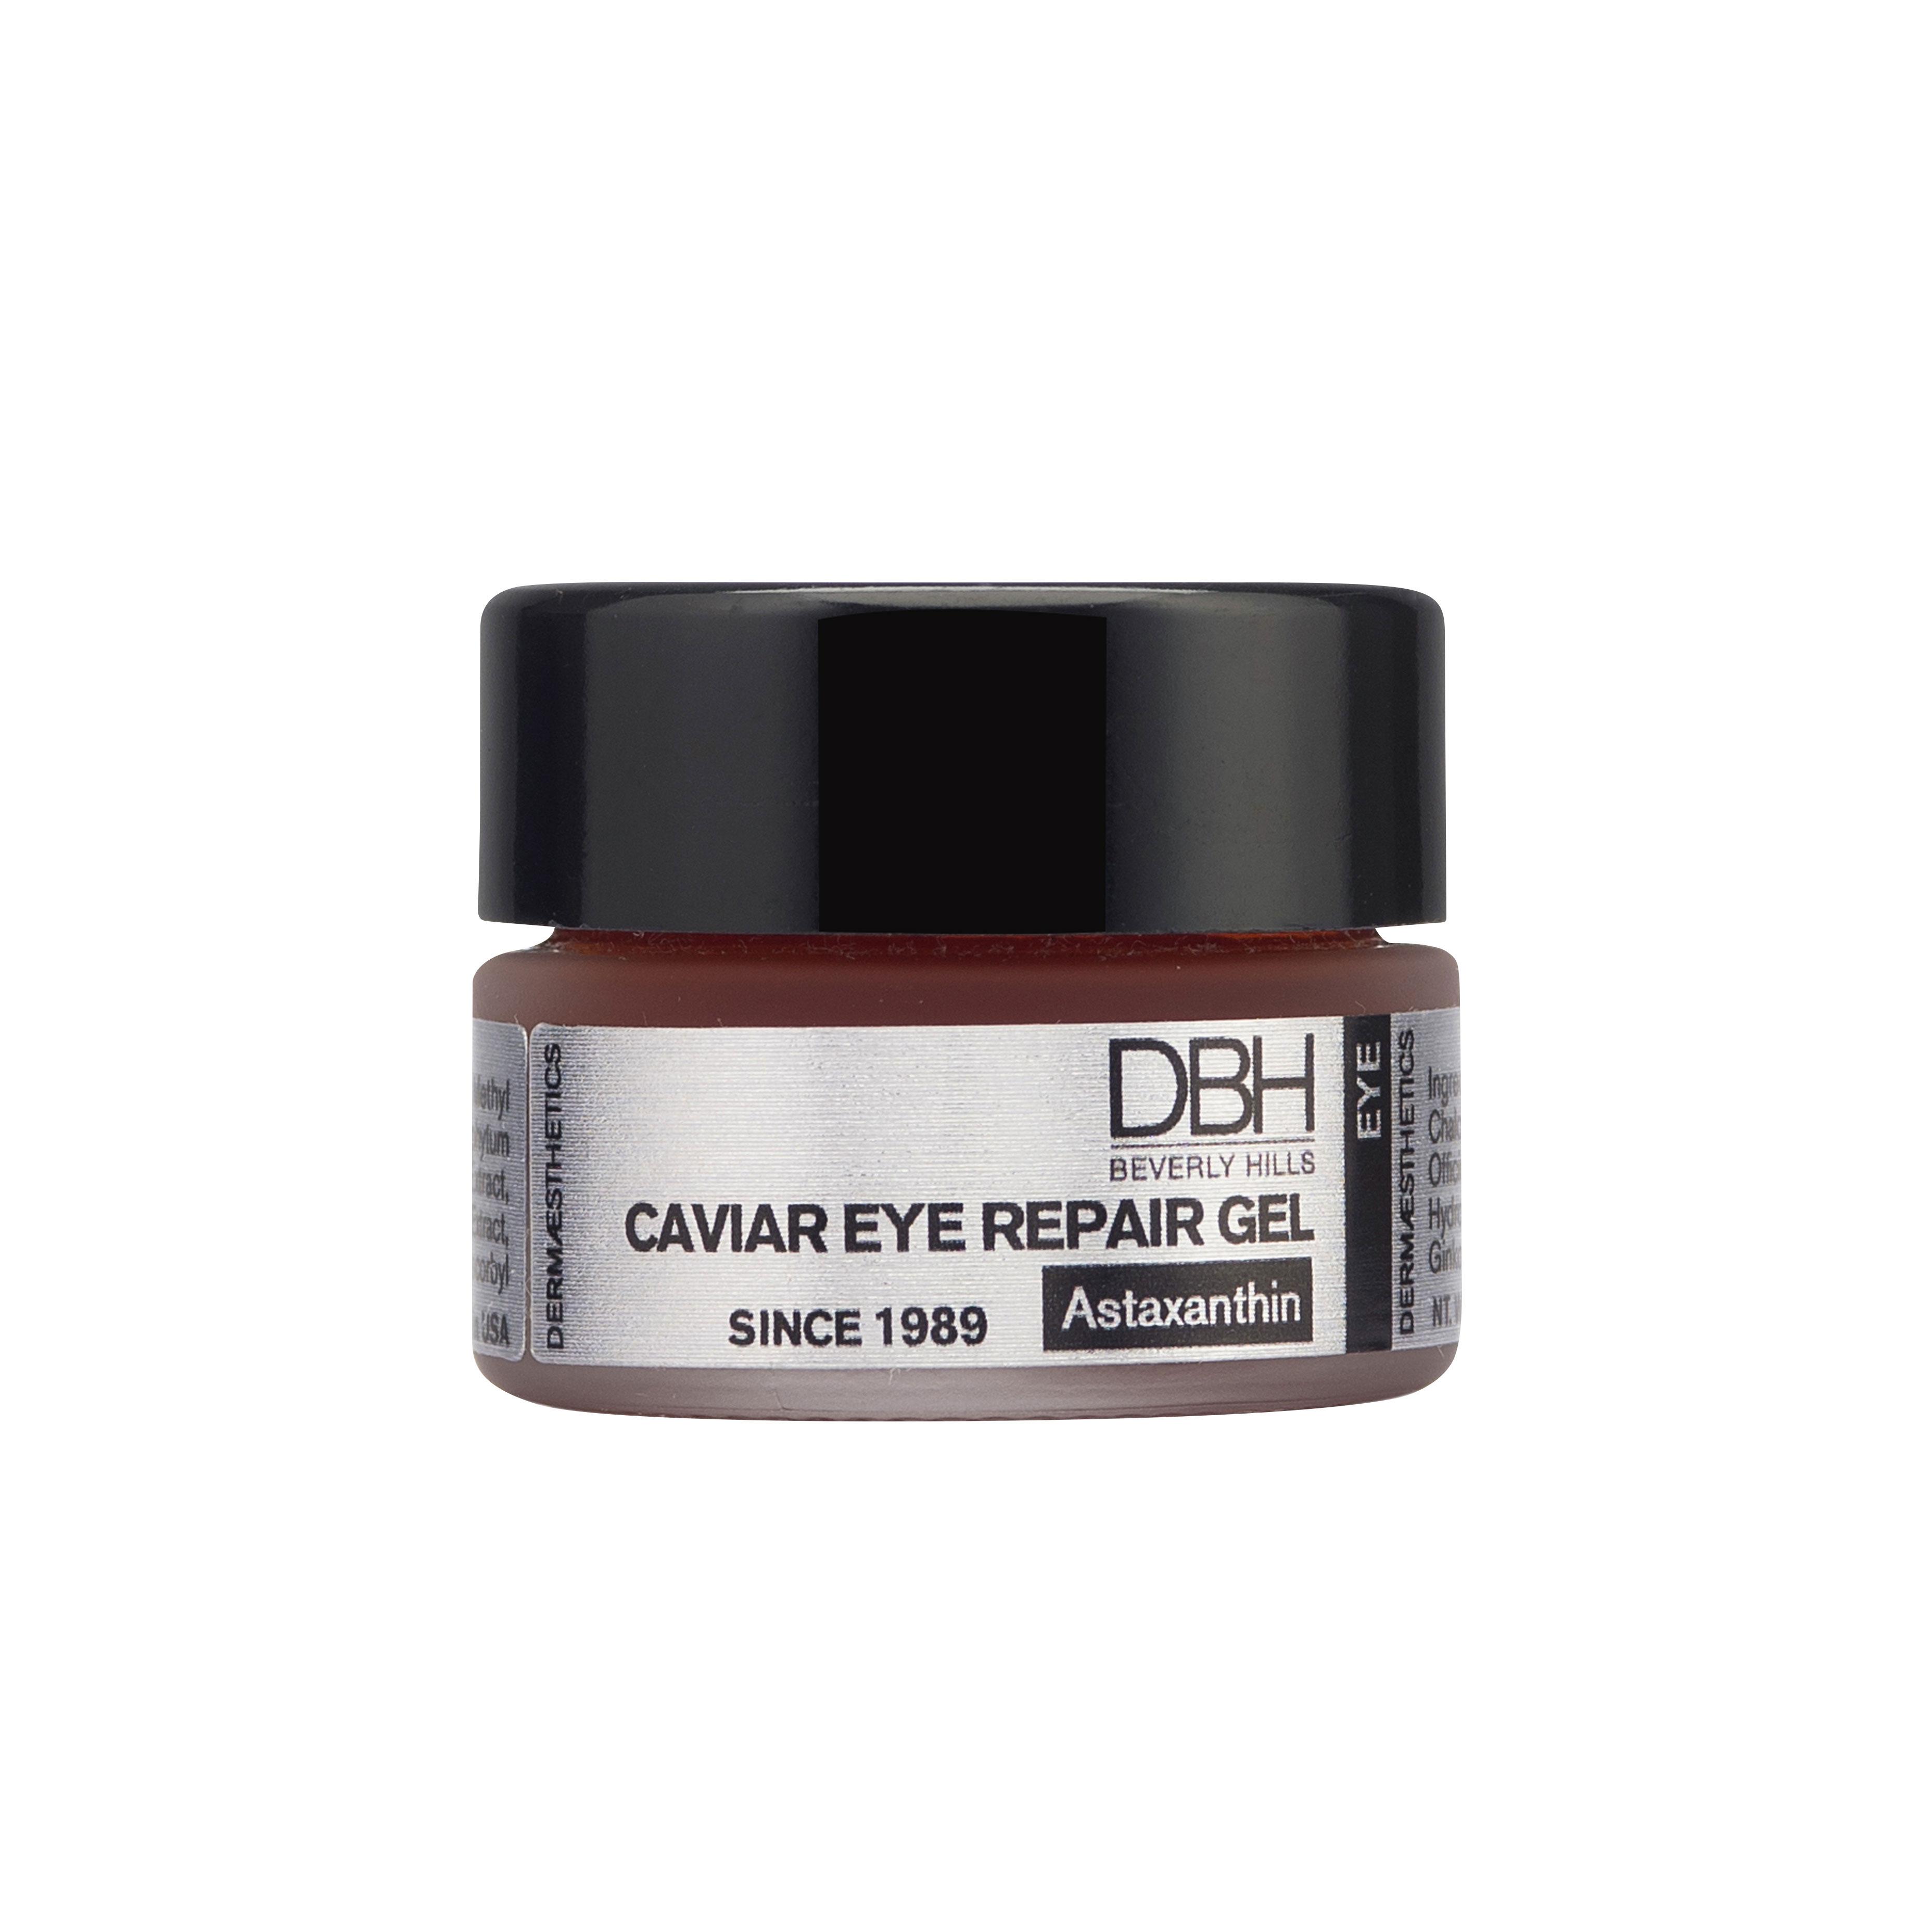 DBH Caviar Eye Repair Gel